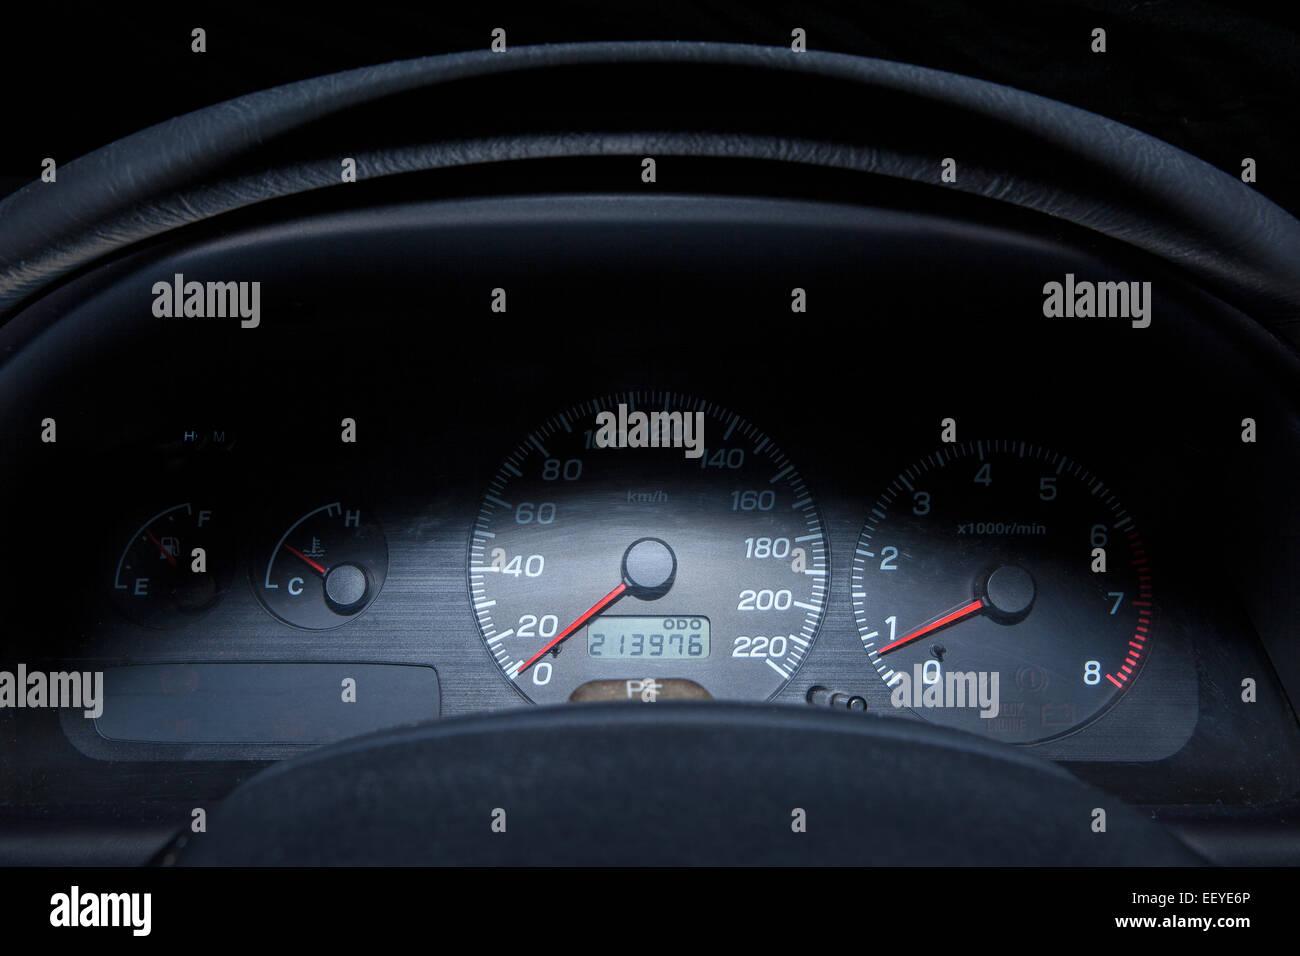 dash board - Stock Image